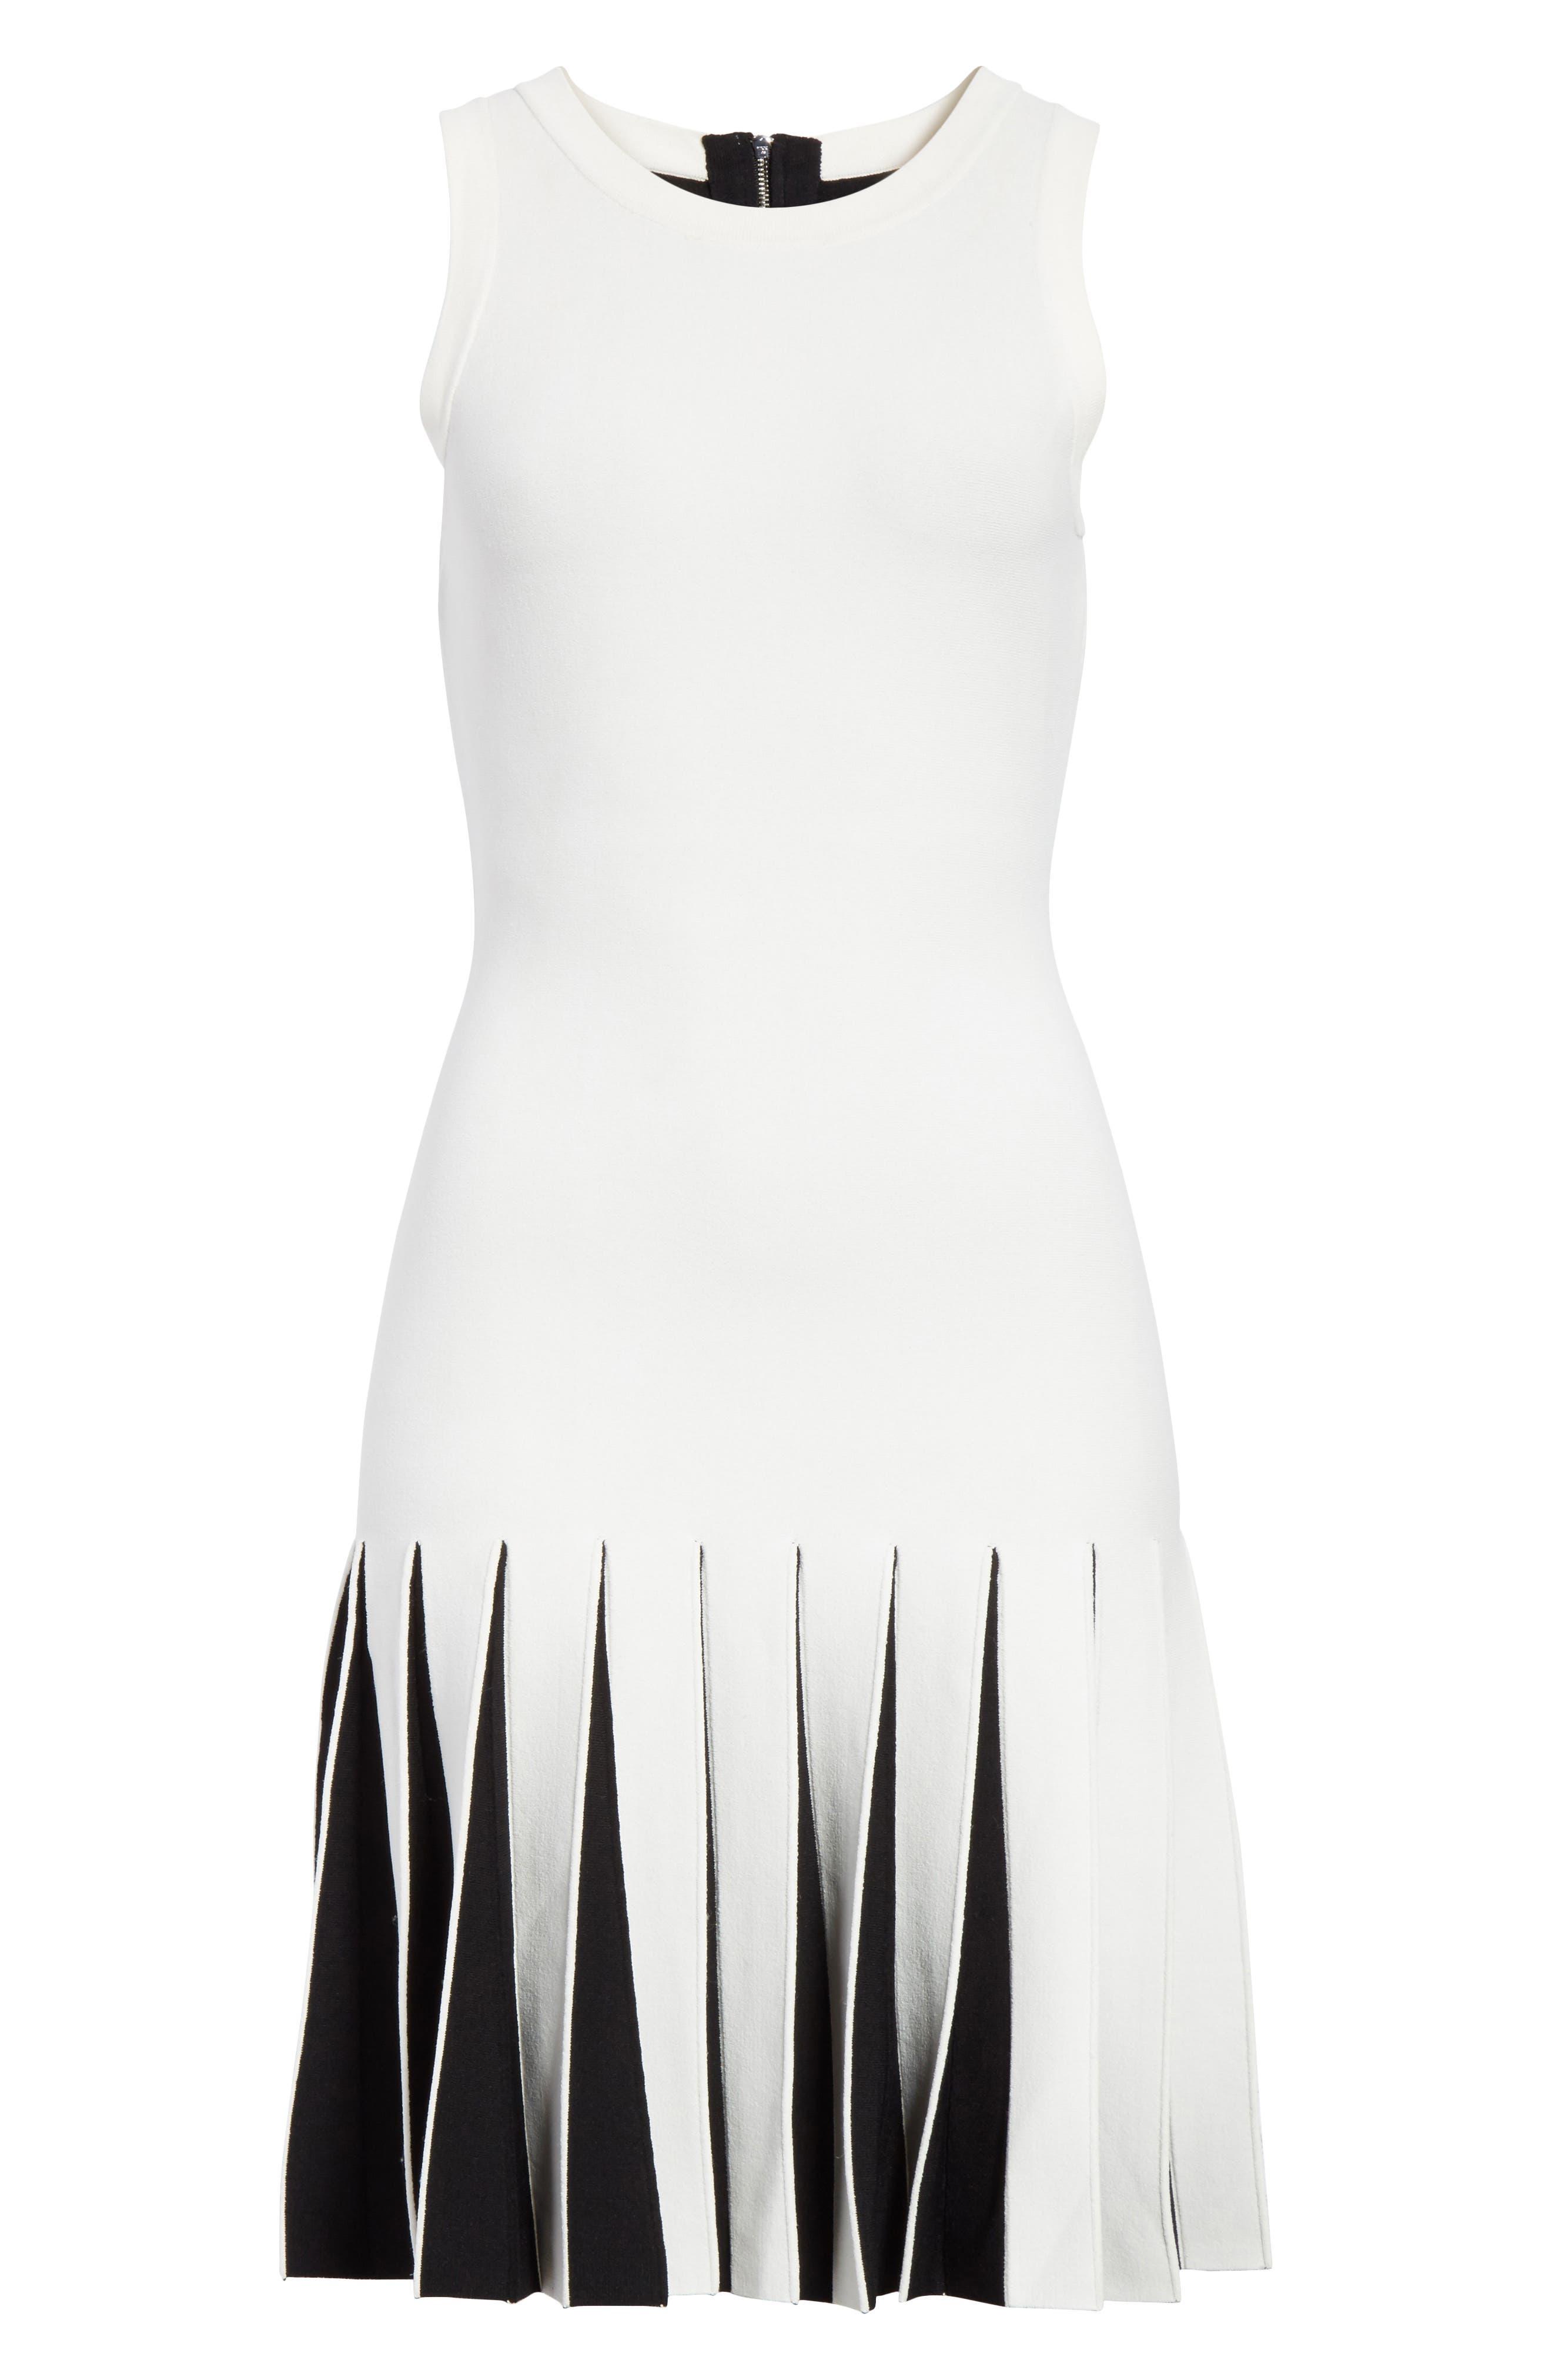 Pleated Contrast Drop Waist Dress,                             Alternate thumbnail 6, color,                             White/ Black